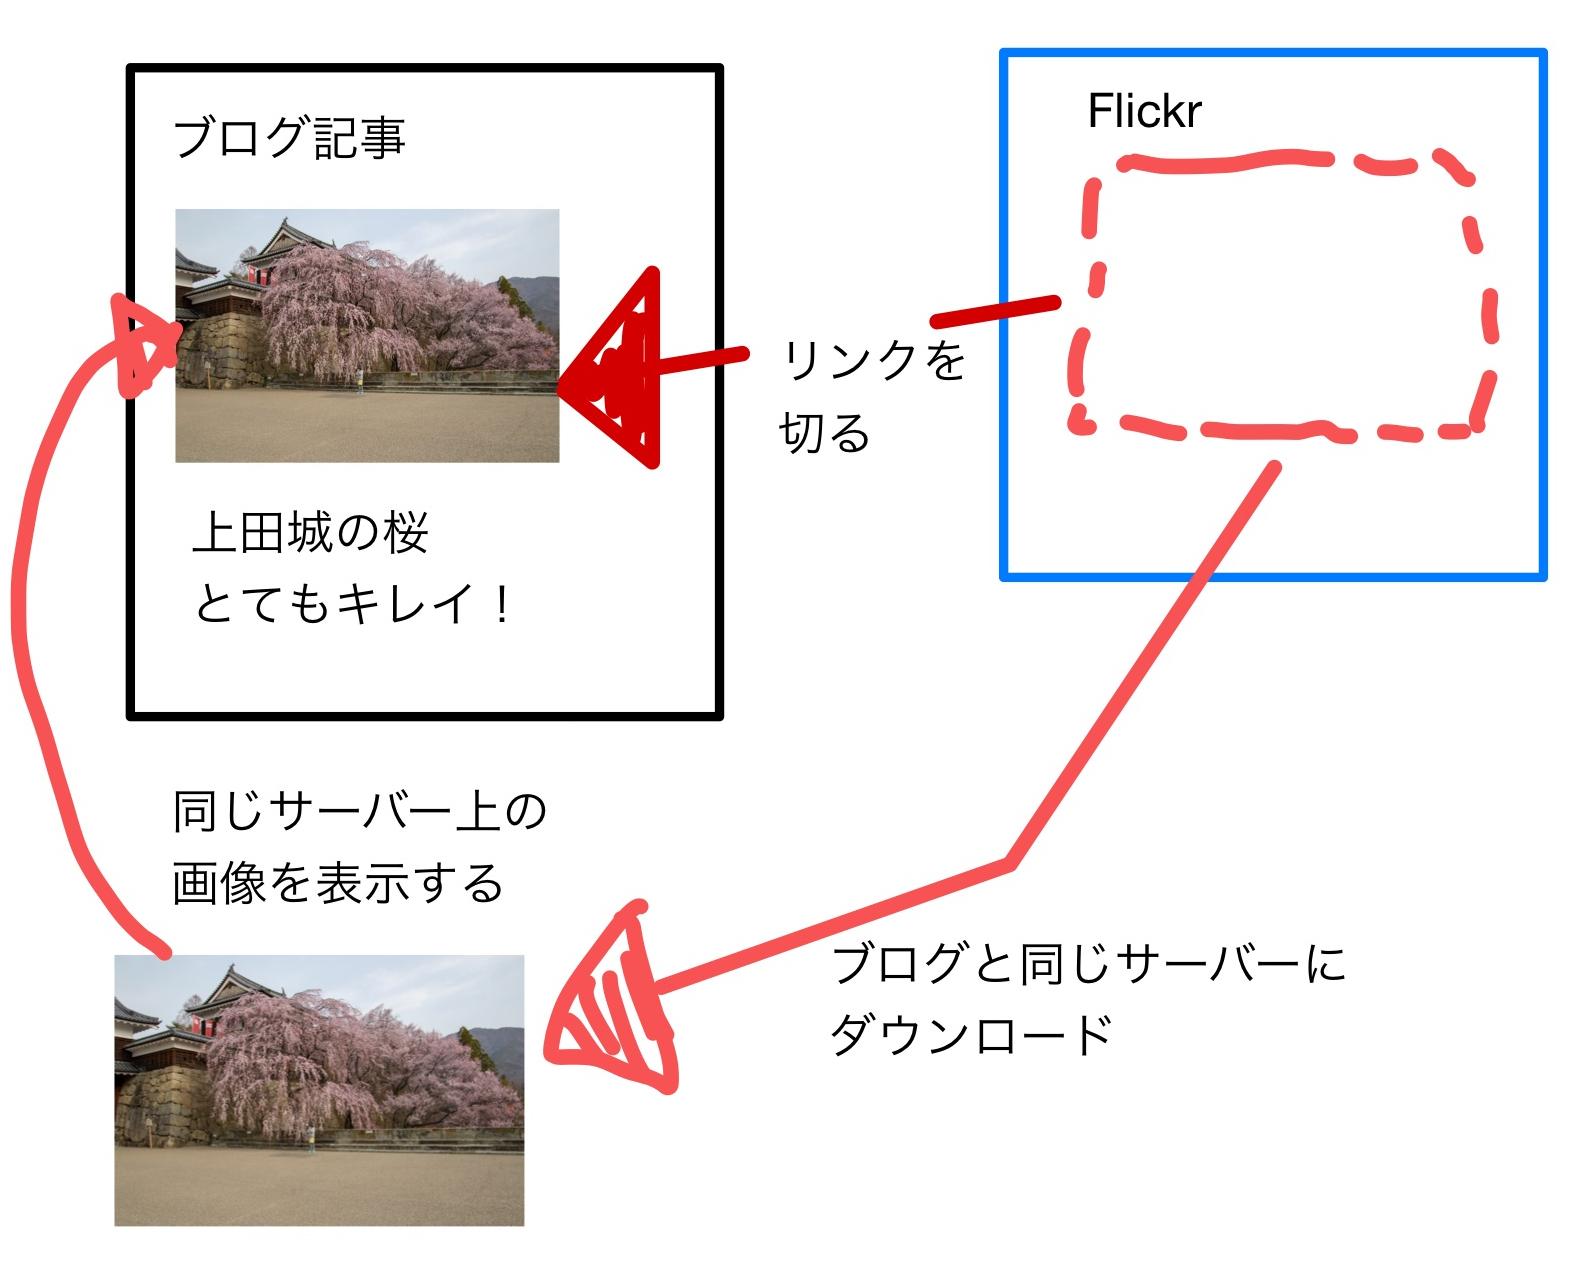 Flickr画像をローカル保存してリンクを貼り替える